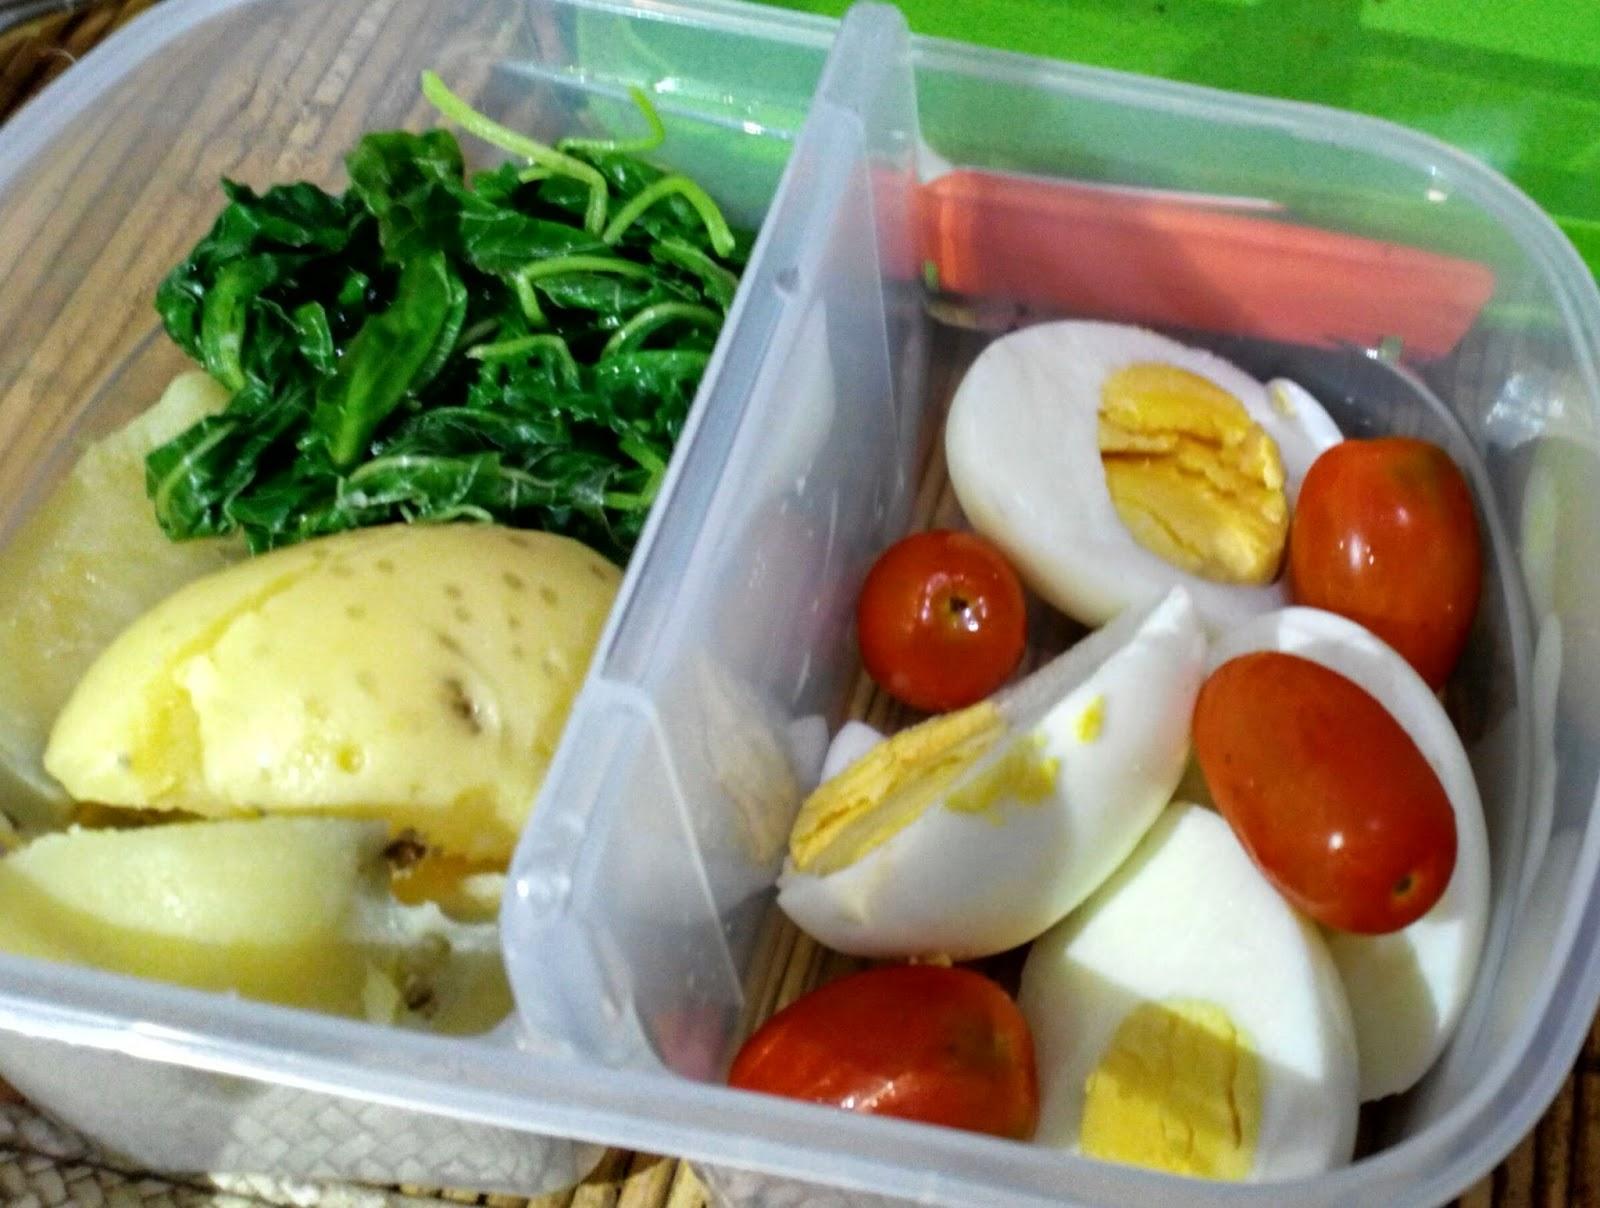 10 Makanan yang Dianjurkan Untuk Penderita Diabetes